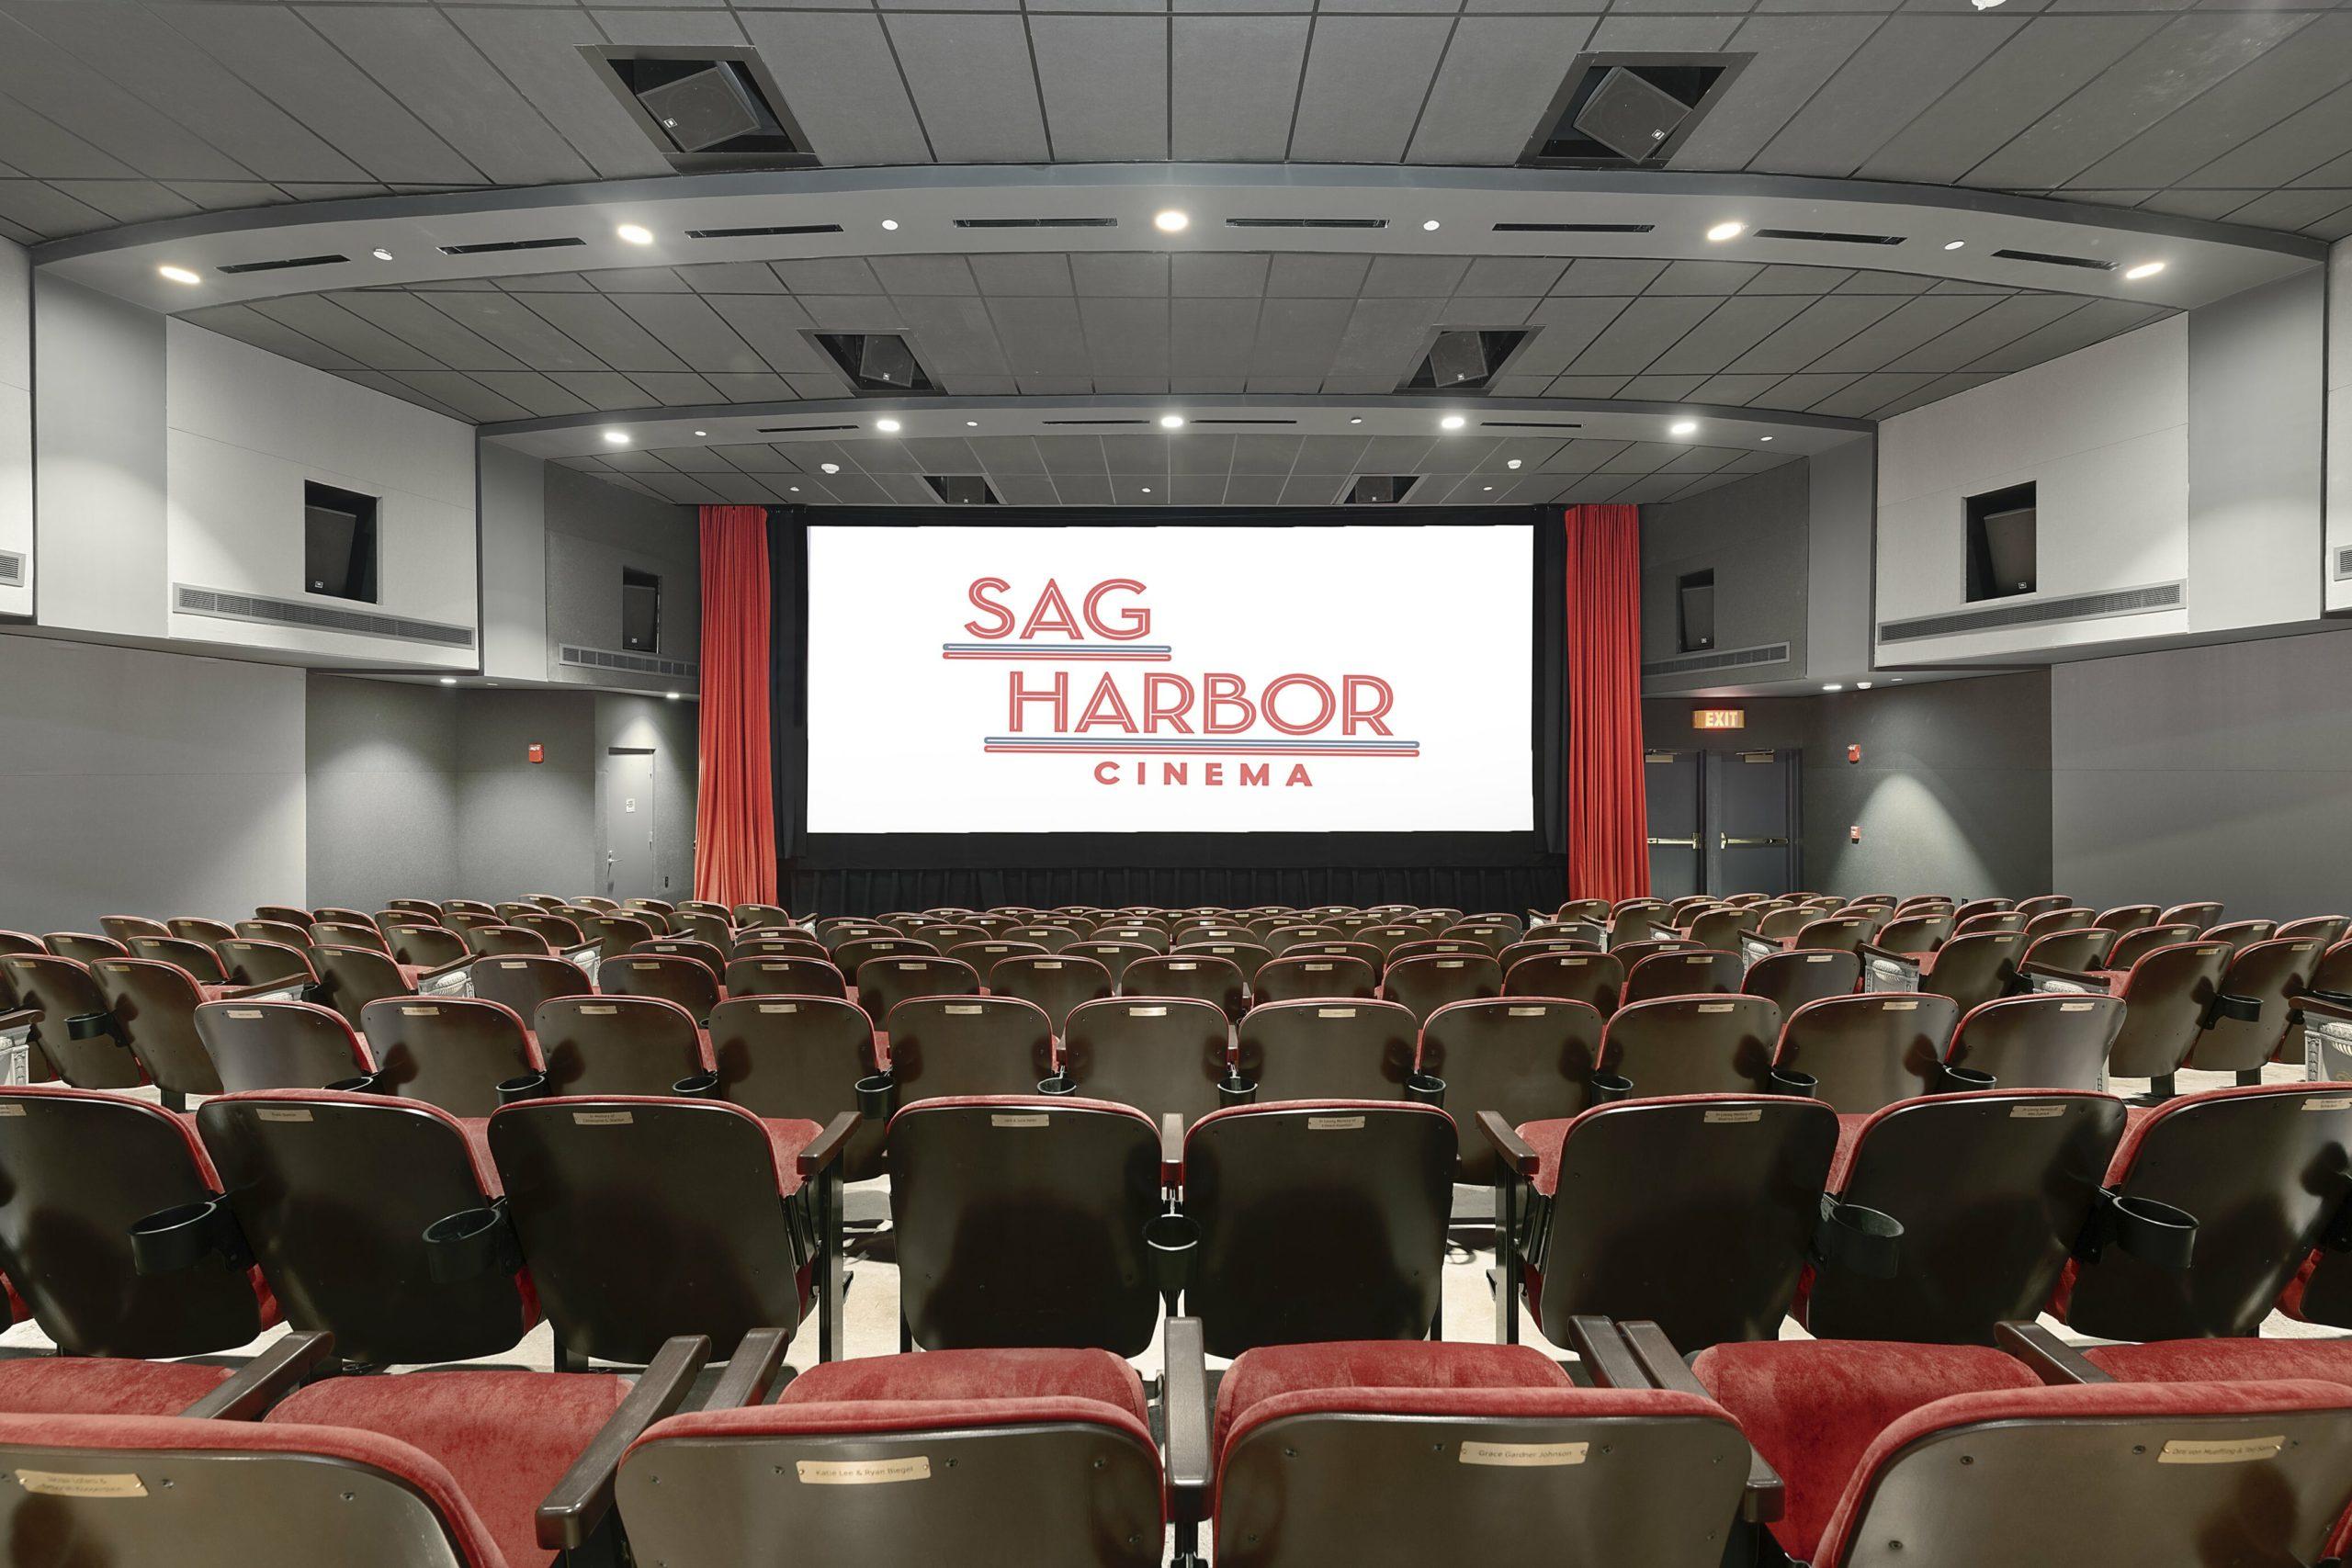 A sneak-peek inside the main theater at the new Sag Harbor Cinema.